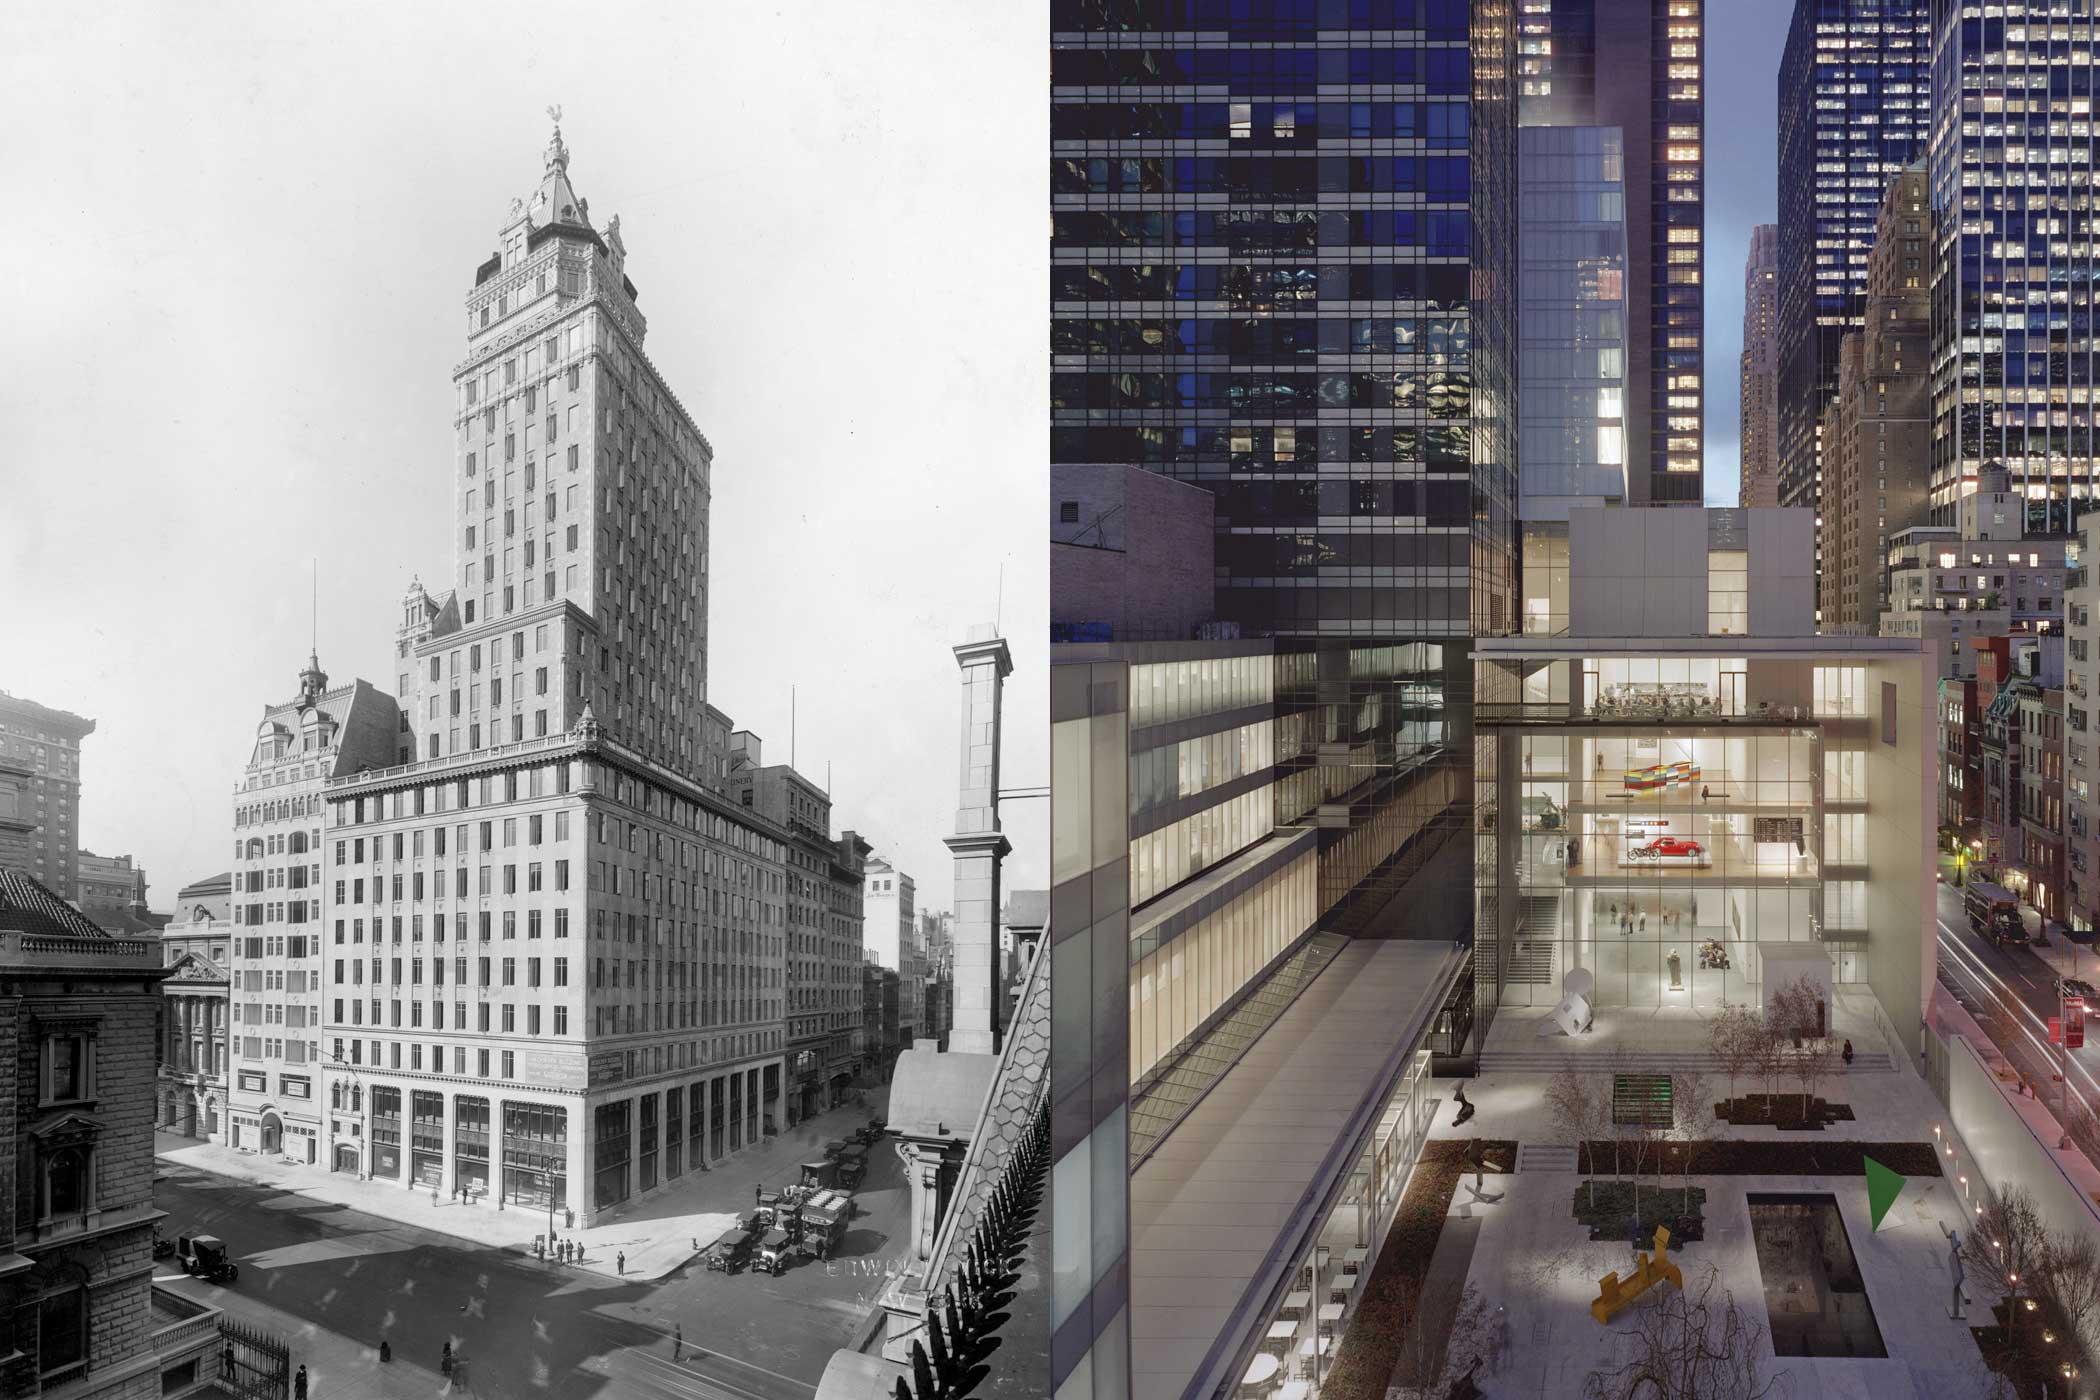 Left: The Heckscher building circa 1925; Right: The current day Museum of Modern Art and its outdoor sculpture garden.